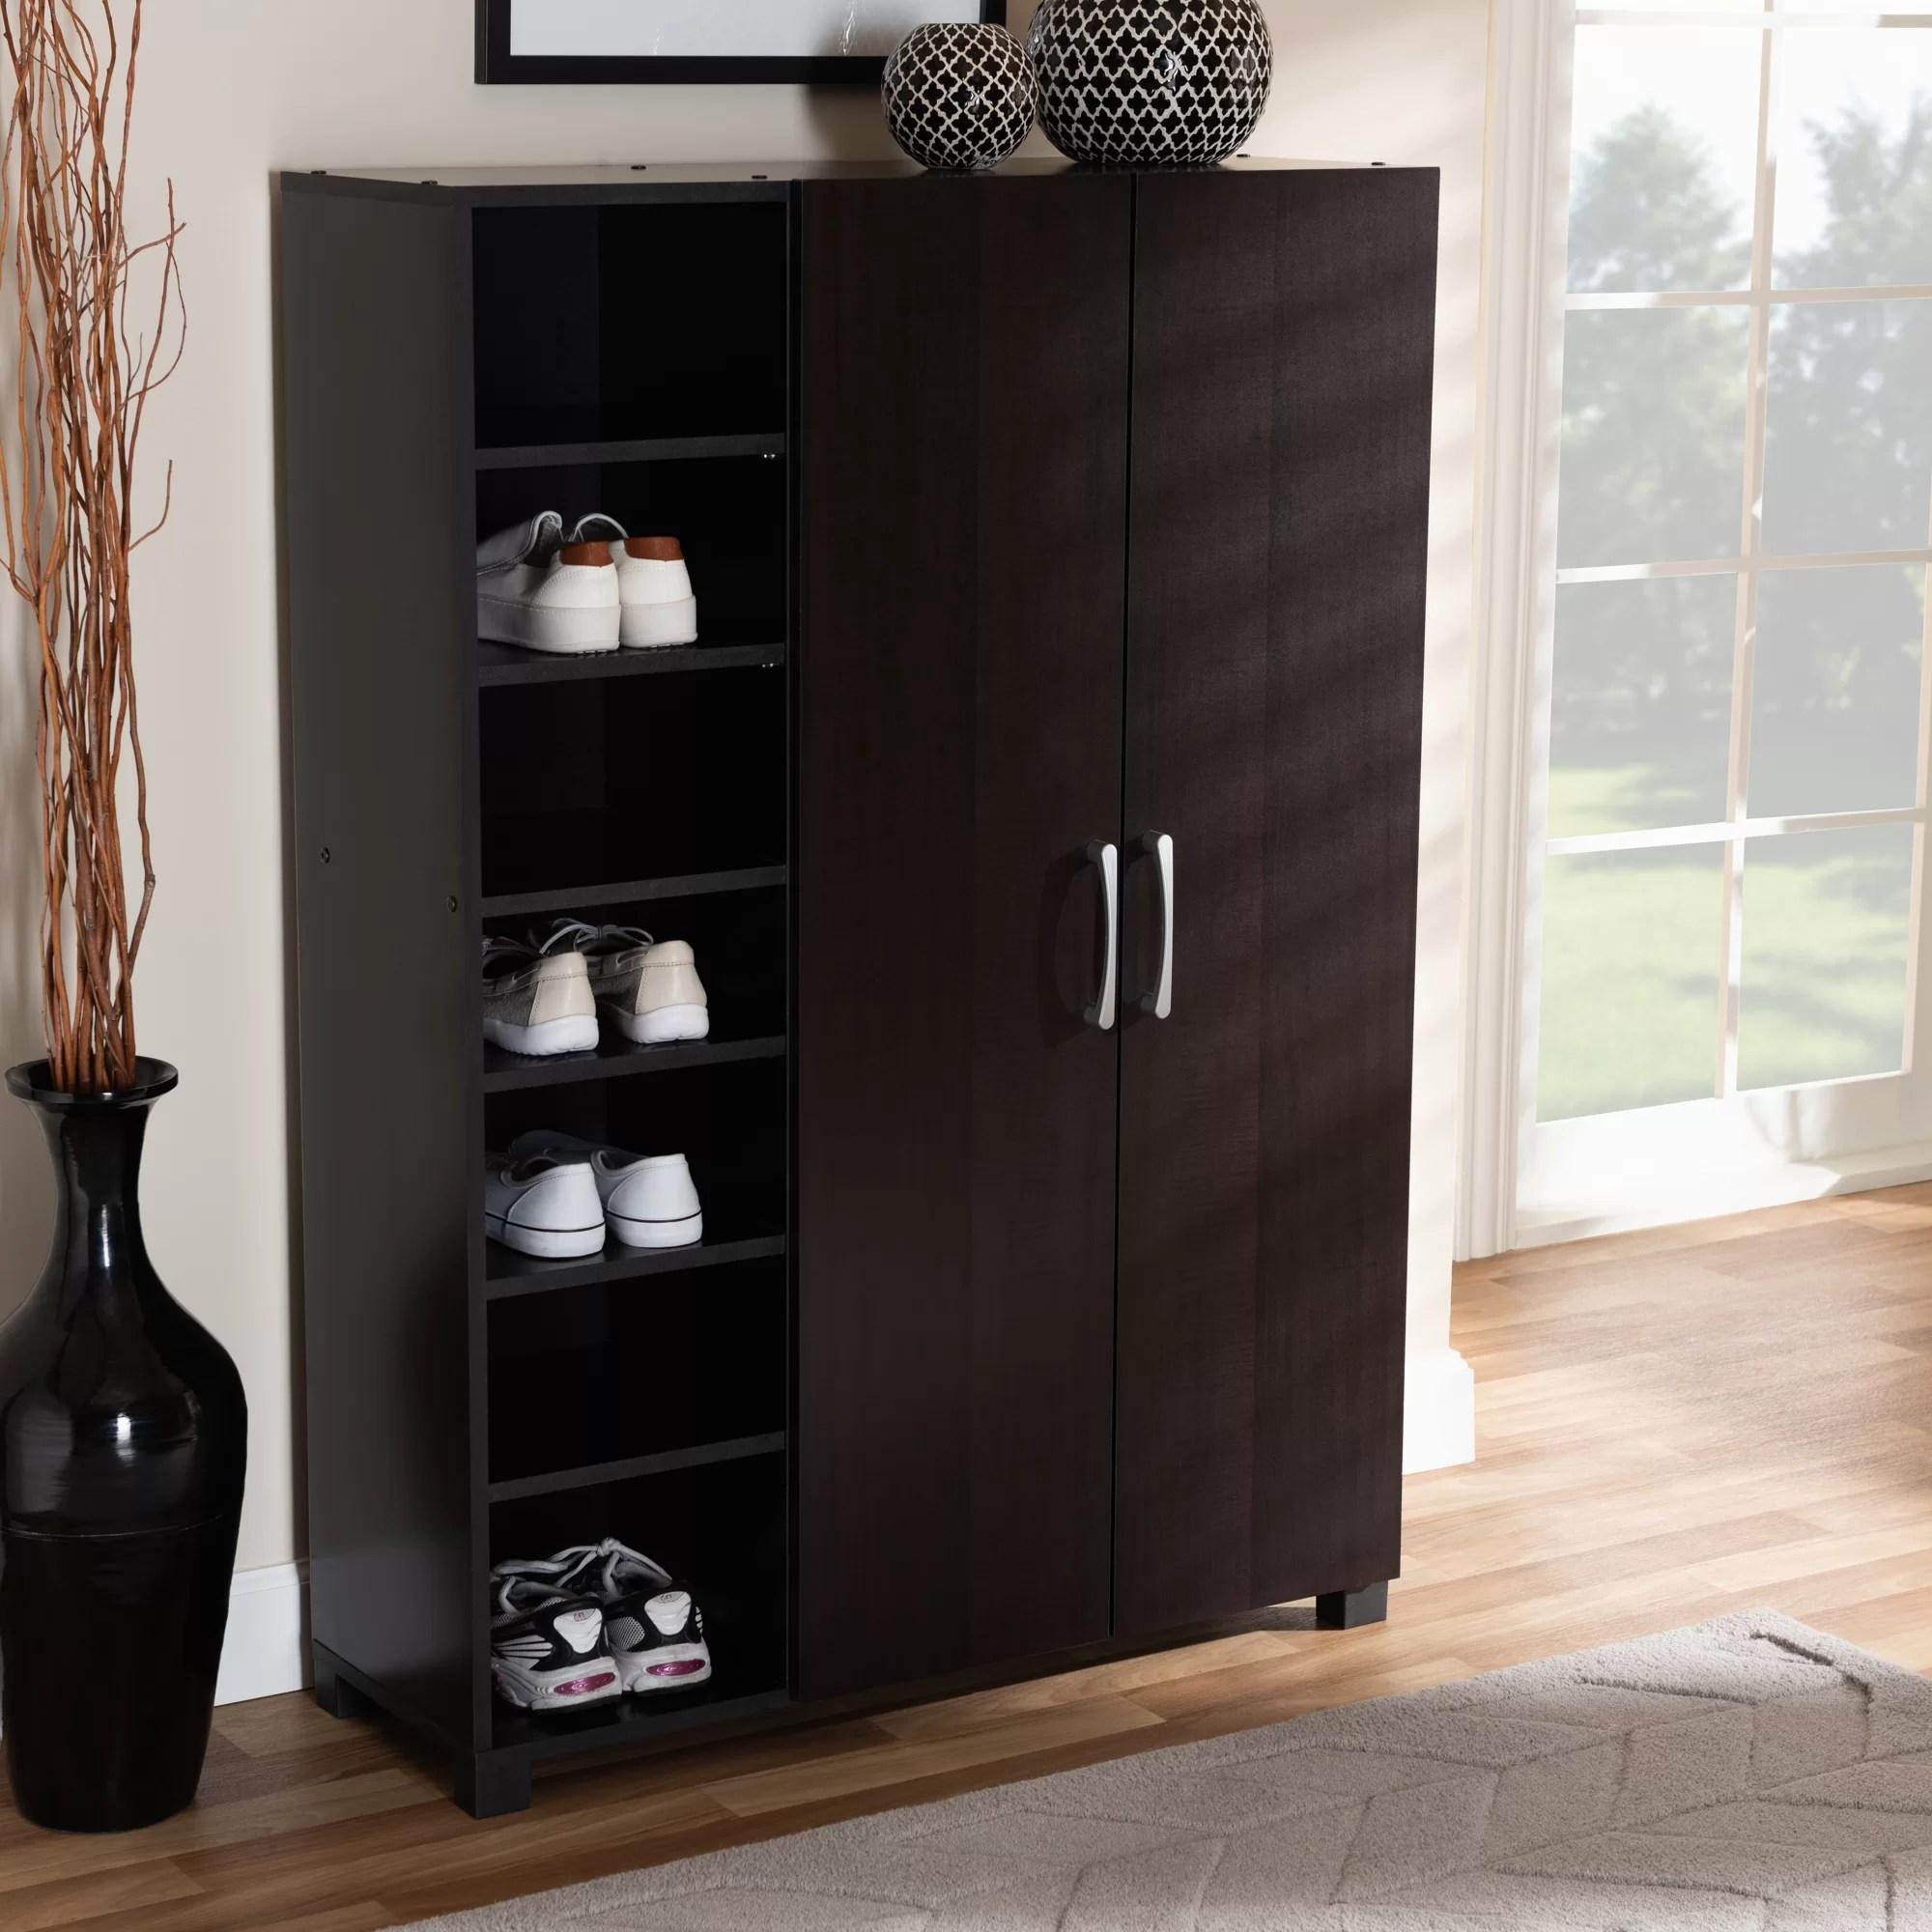 Ebern Designs 2 Door Wood Entryway 19 Pair Shoe Storage Cabinet Reviews